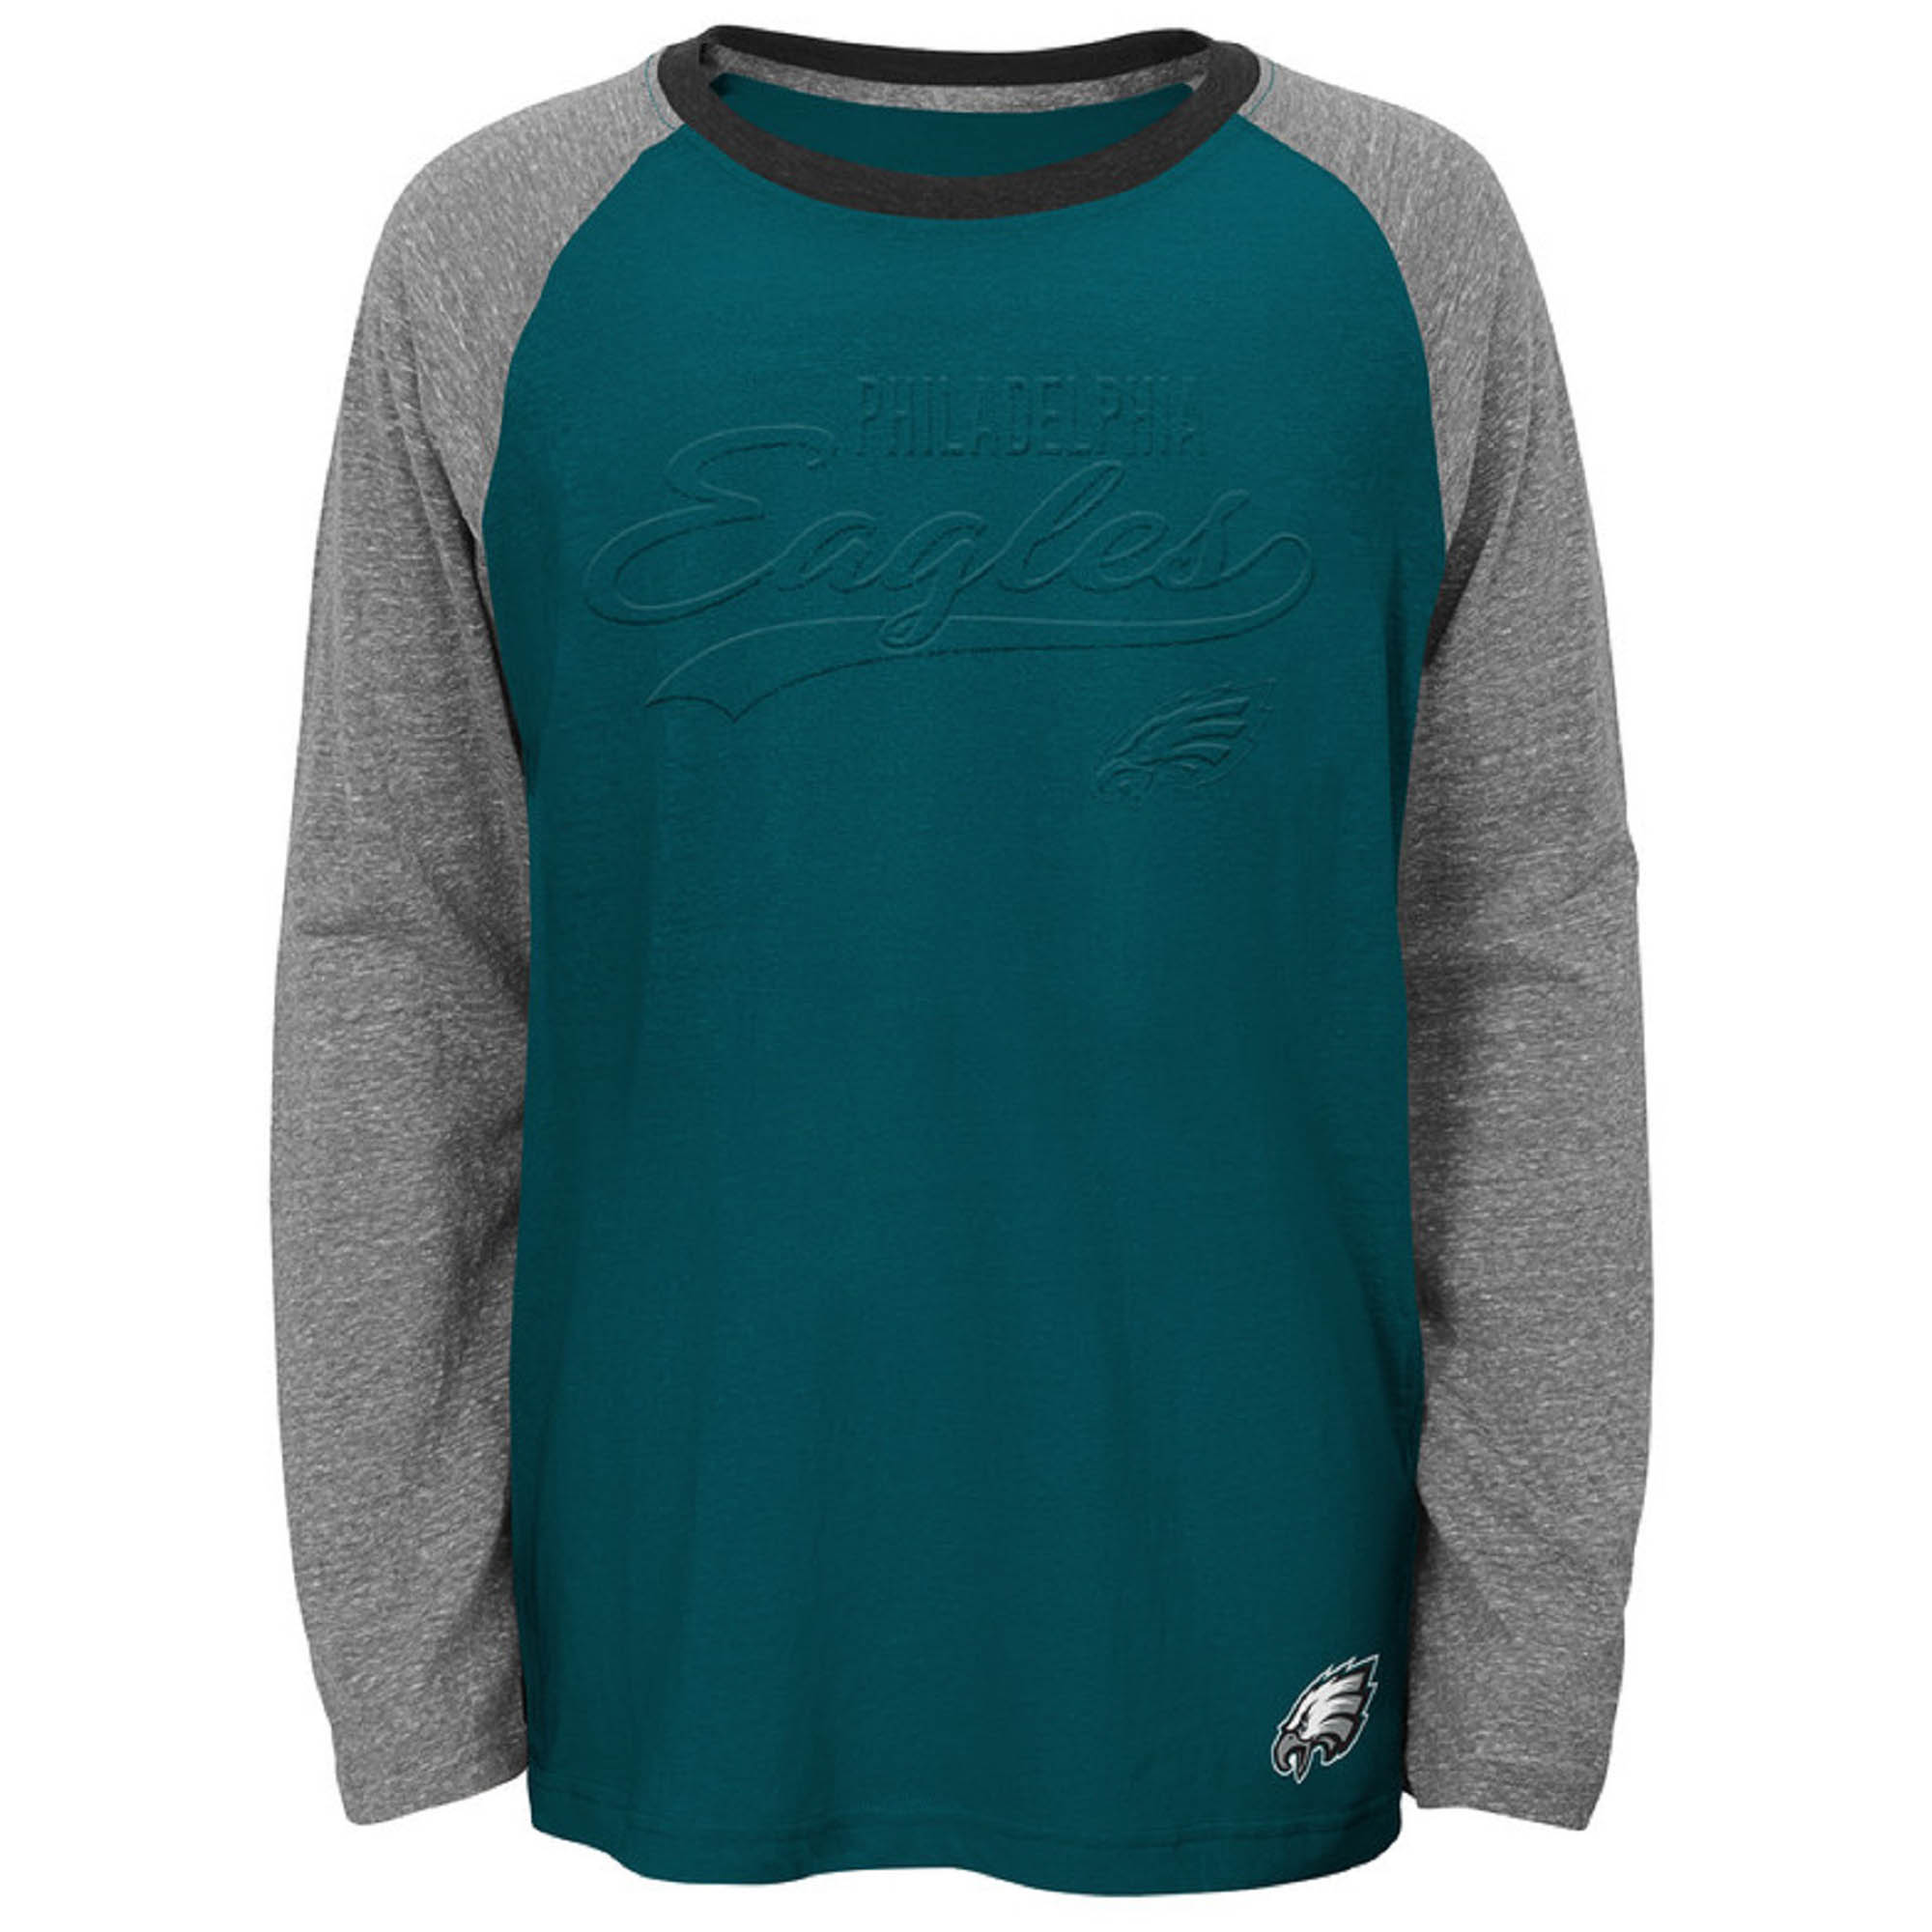 Youth Midnight Green Philadelphia Eagles Long Sleeve Raglan T-Shirt